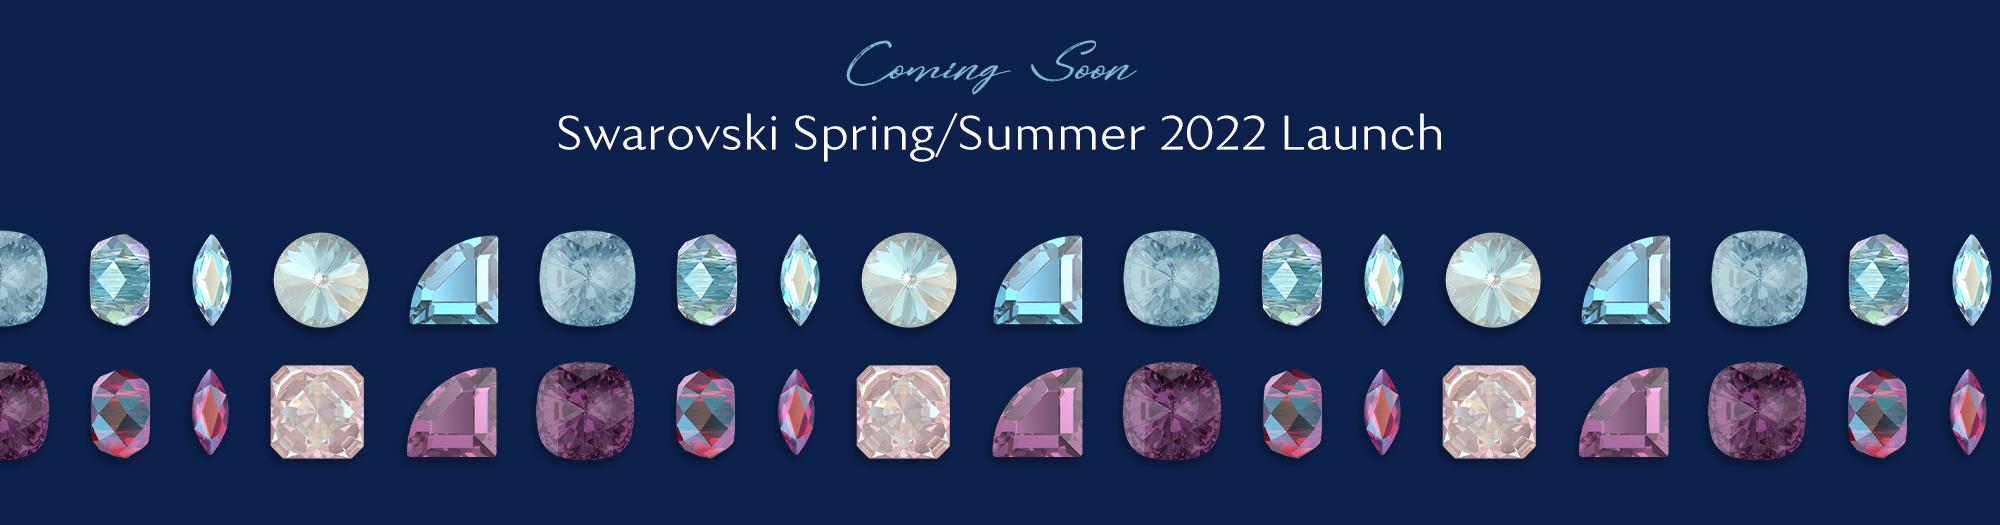 Swar Launch Spring/Summer 2022